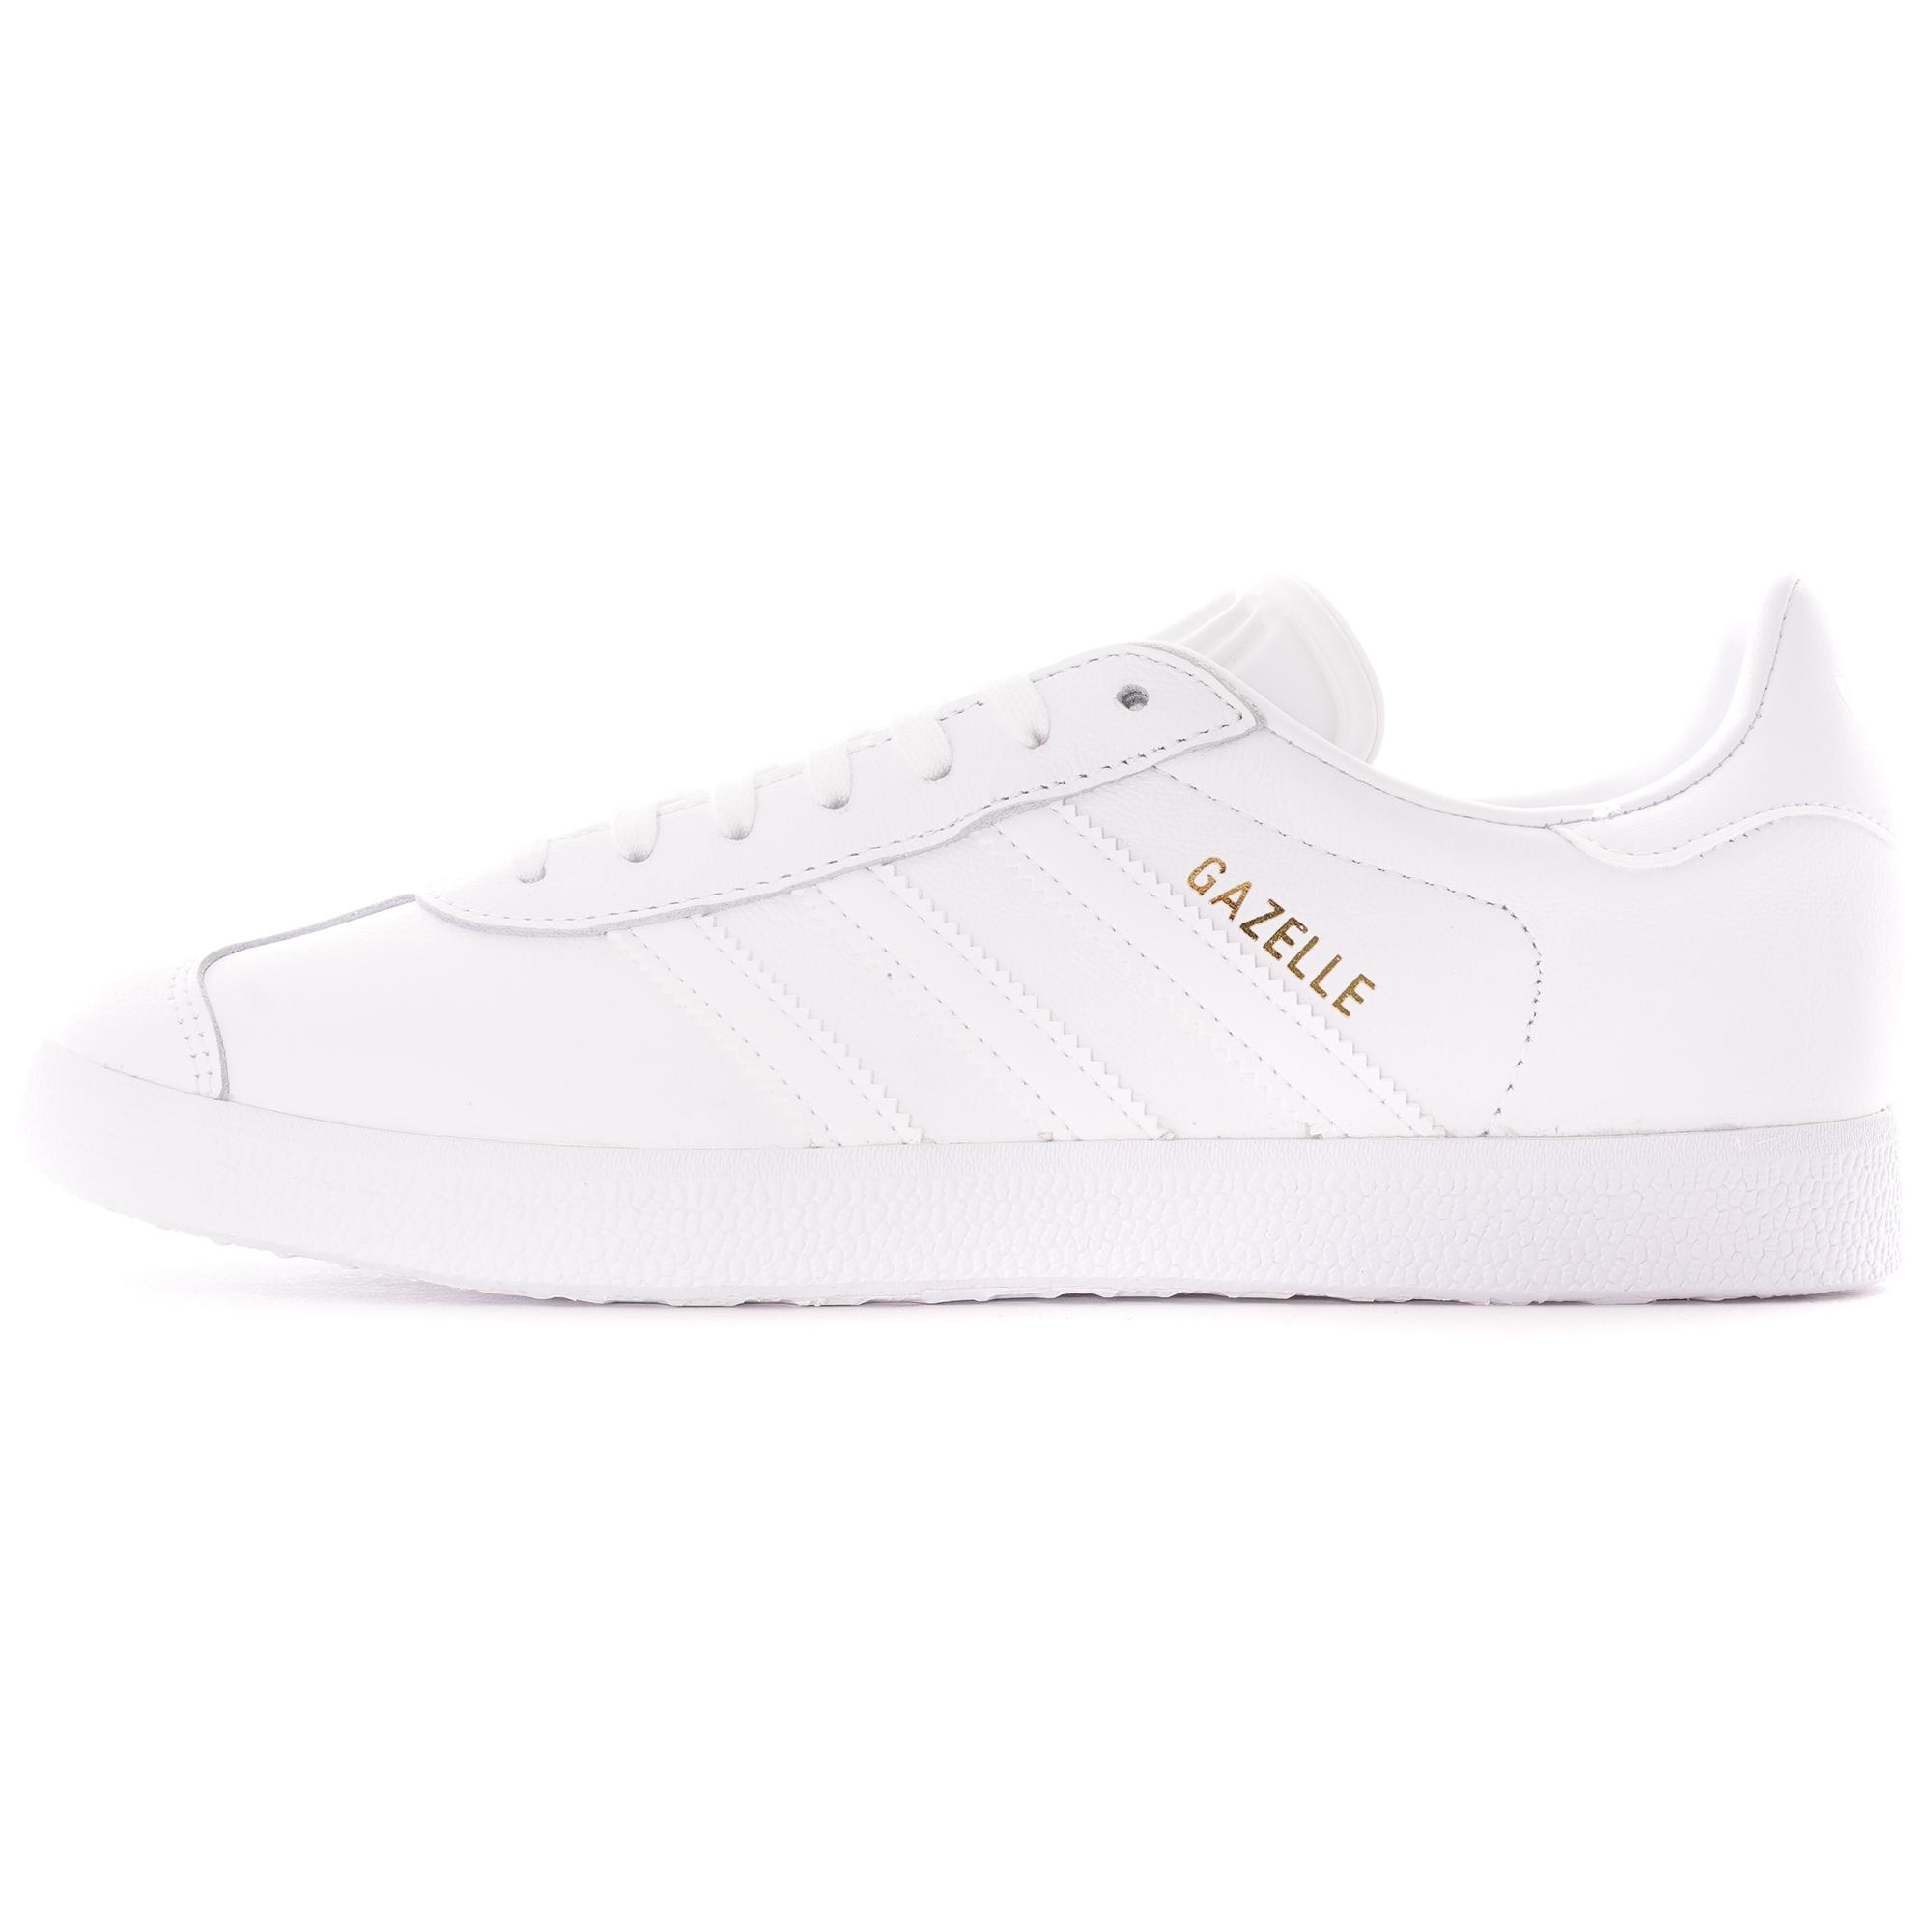 Adidas Originals Gazelle White